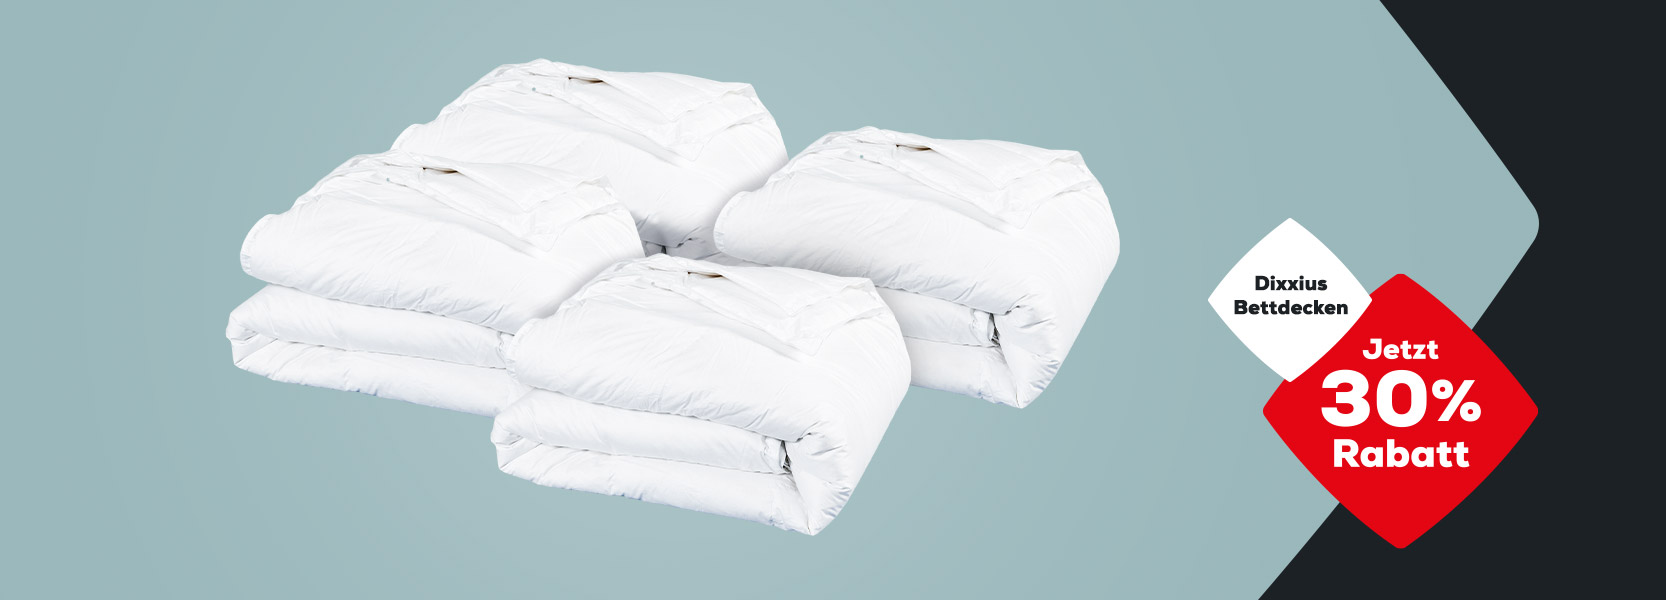 30% Rabatt auf Dixxius Bettdecken | Swiss Sense